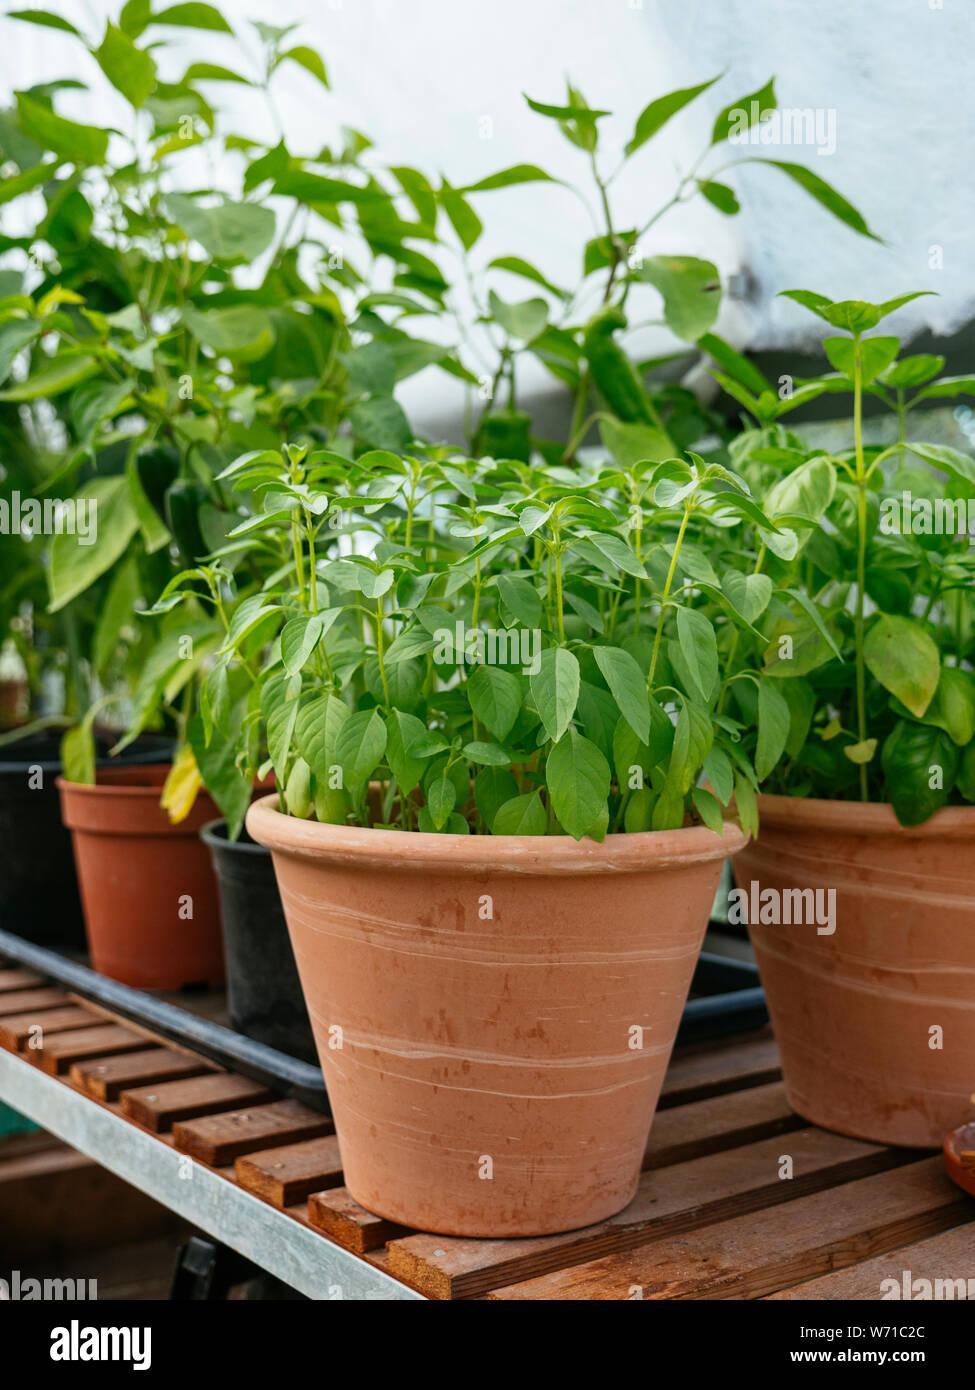 Lemon basil growing in a terracotta pot in a greenhouse. Stock Photo